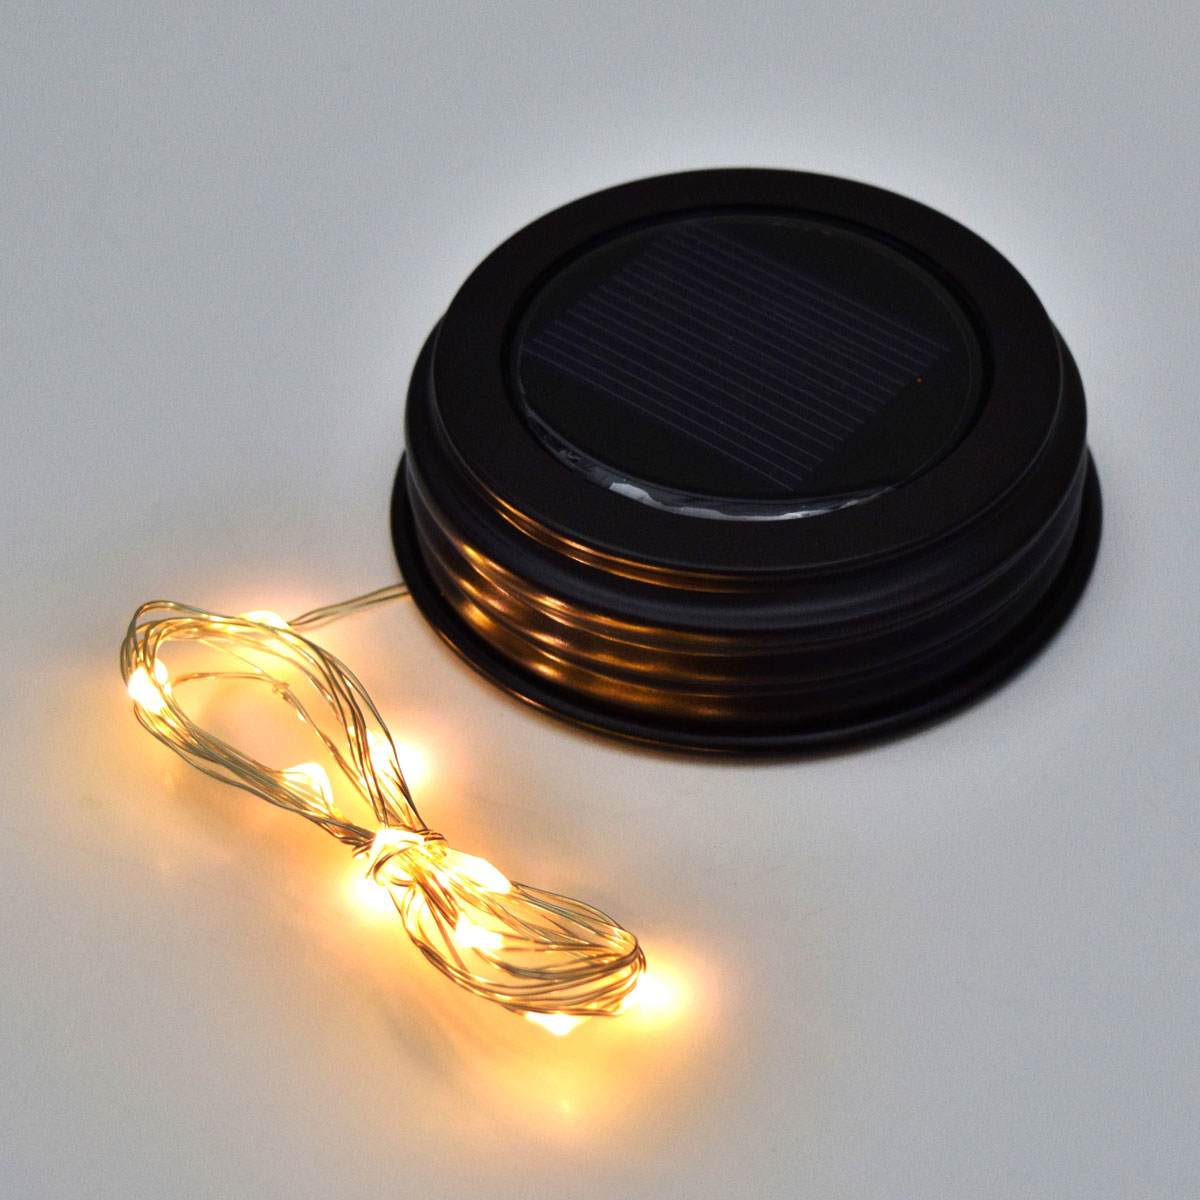 Fairy Lights LED Mason Jar Lid Solar Powered